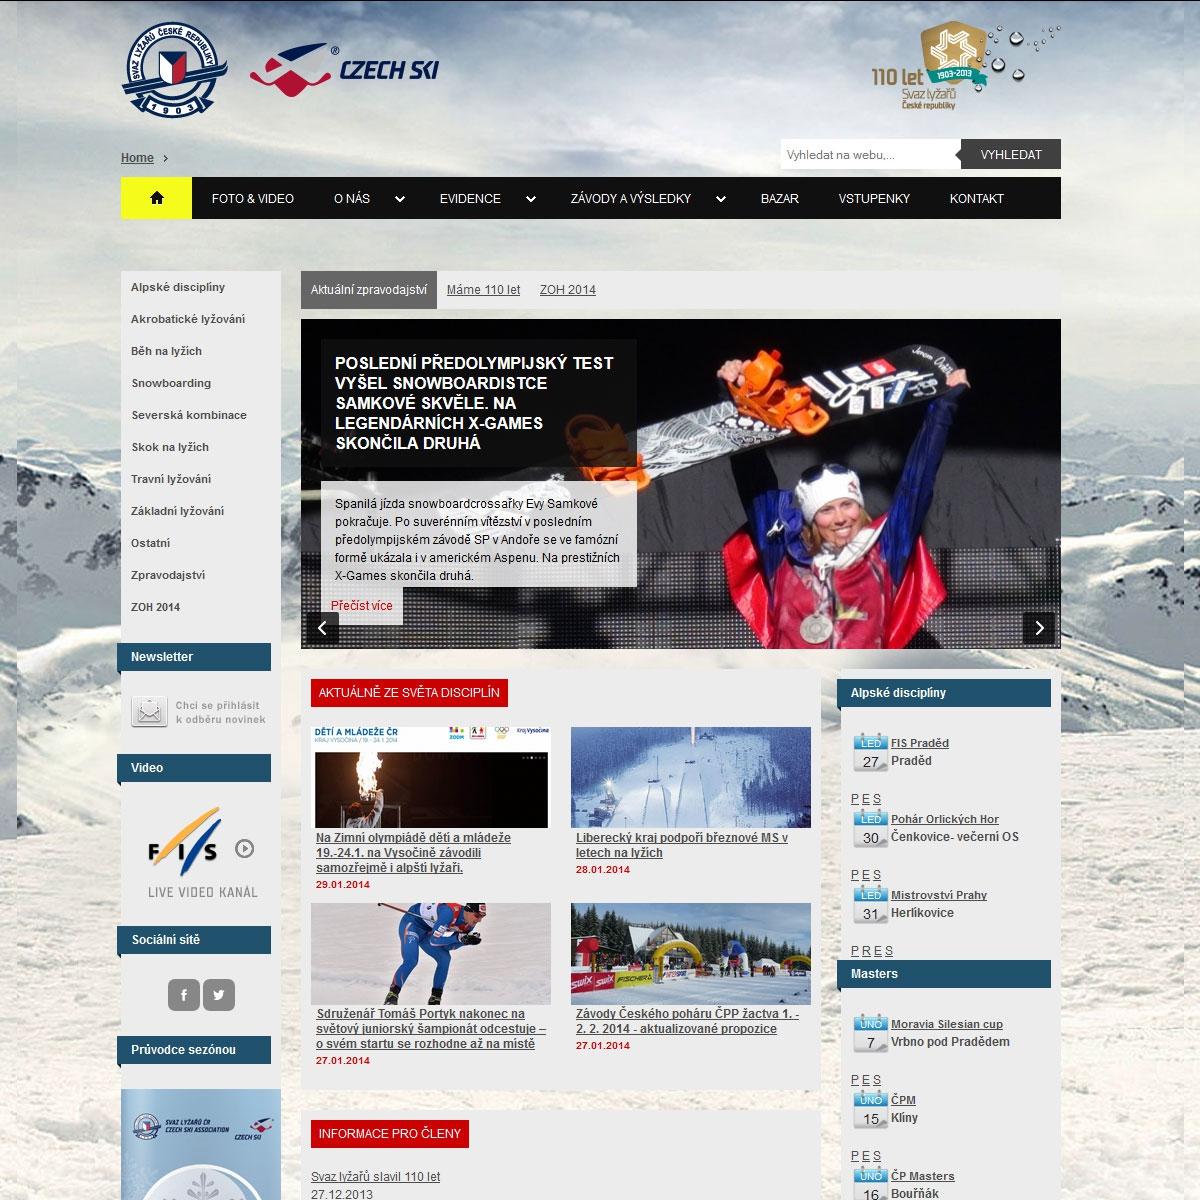 Fotografie czech-ski2014-1_big.jpg